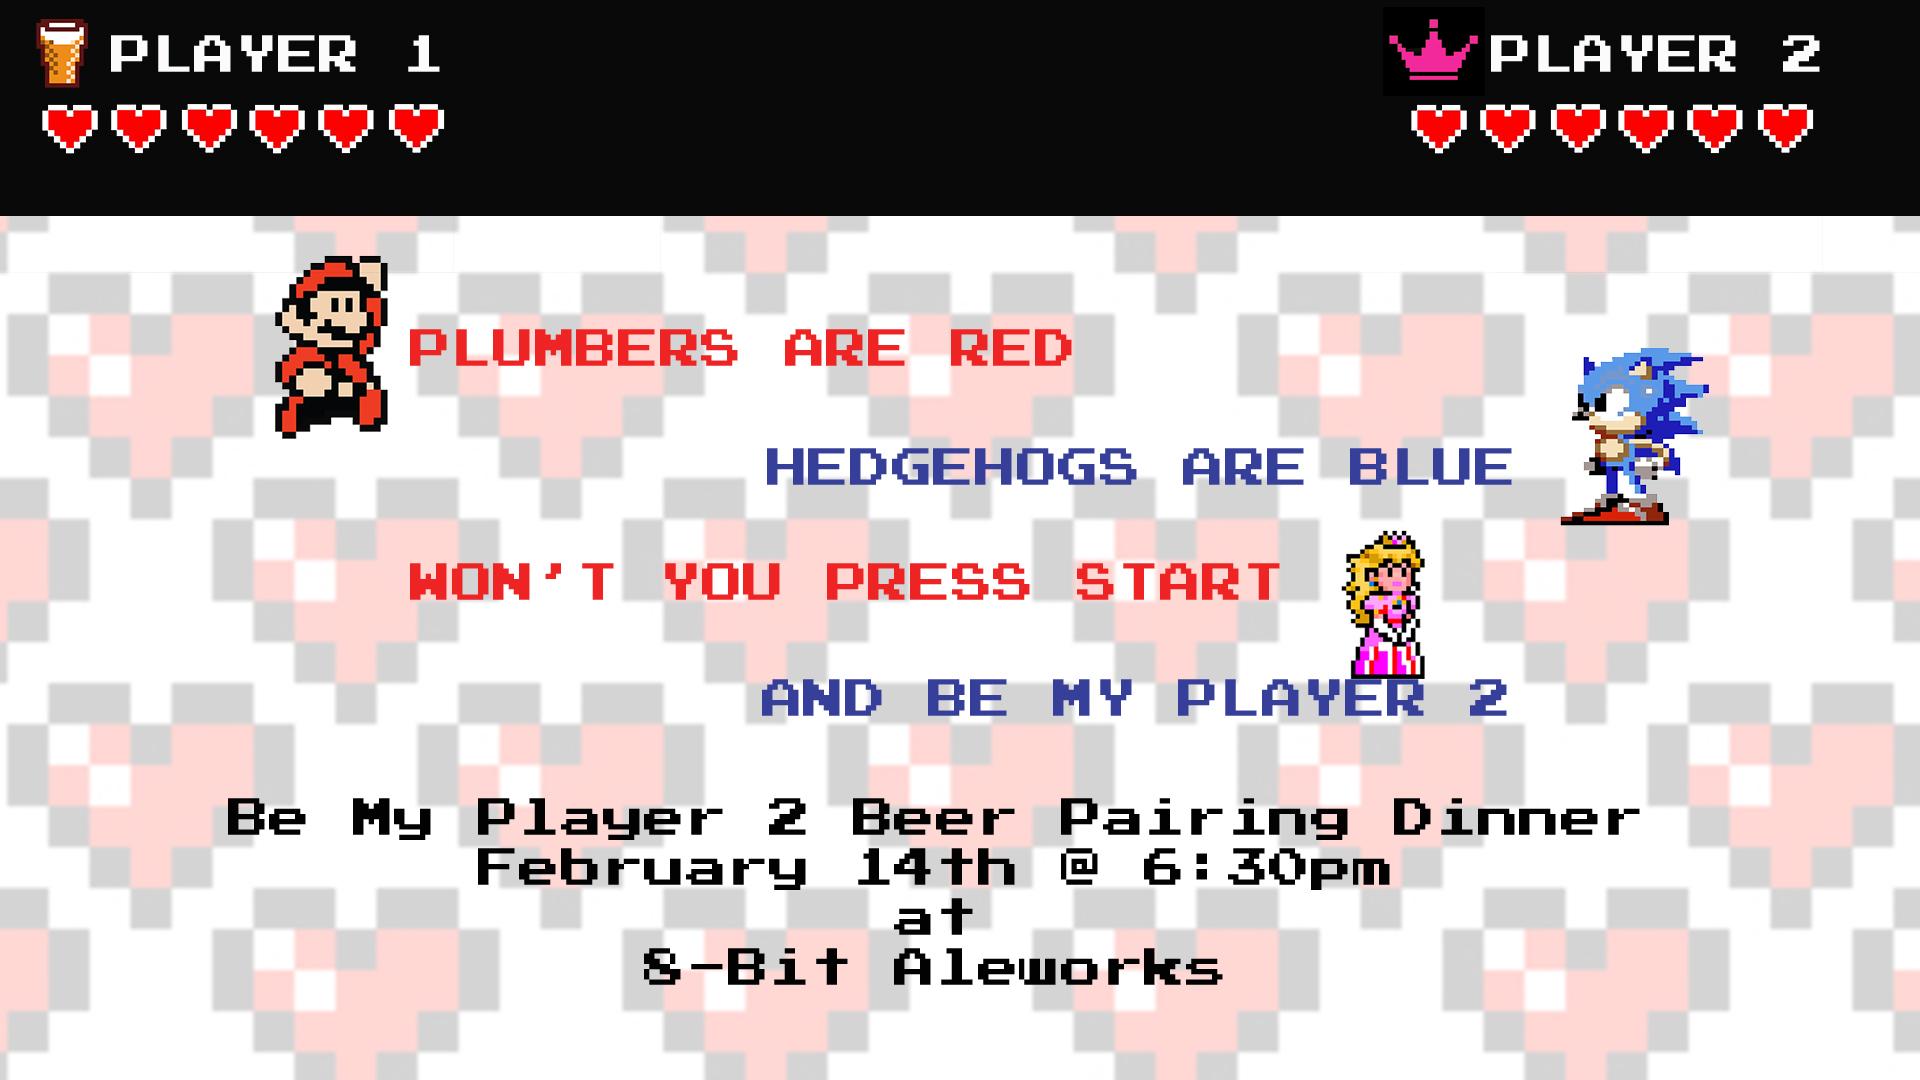 Be My Player 2 Beer Pairing Dinner